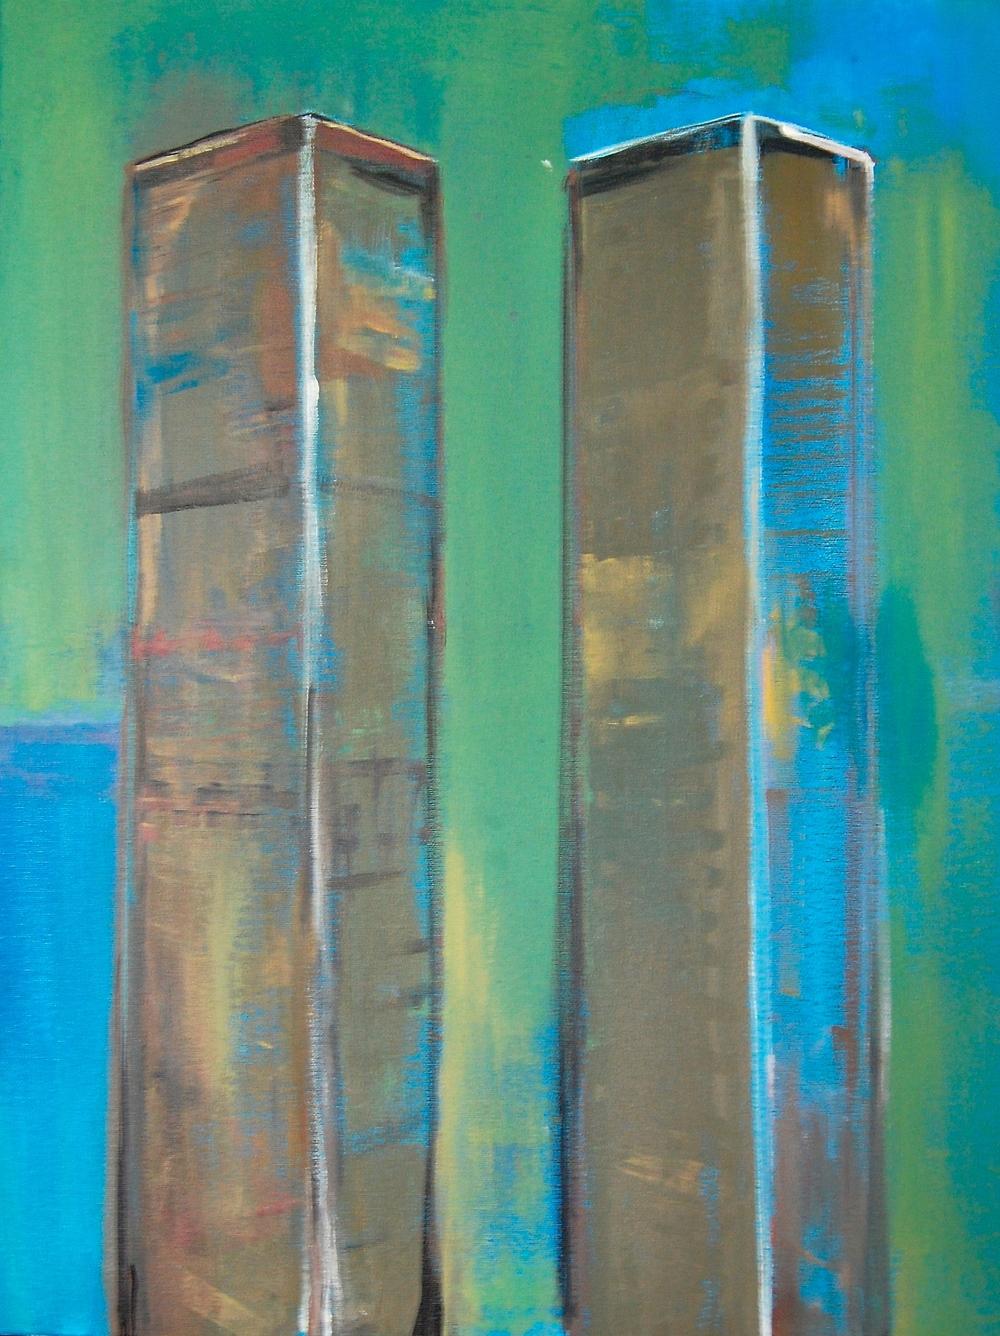 WHOLES: Acrylic on canvas 2014